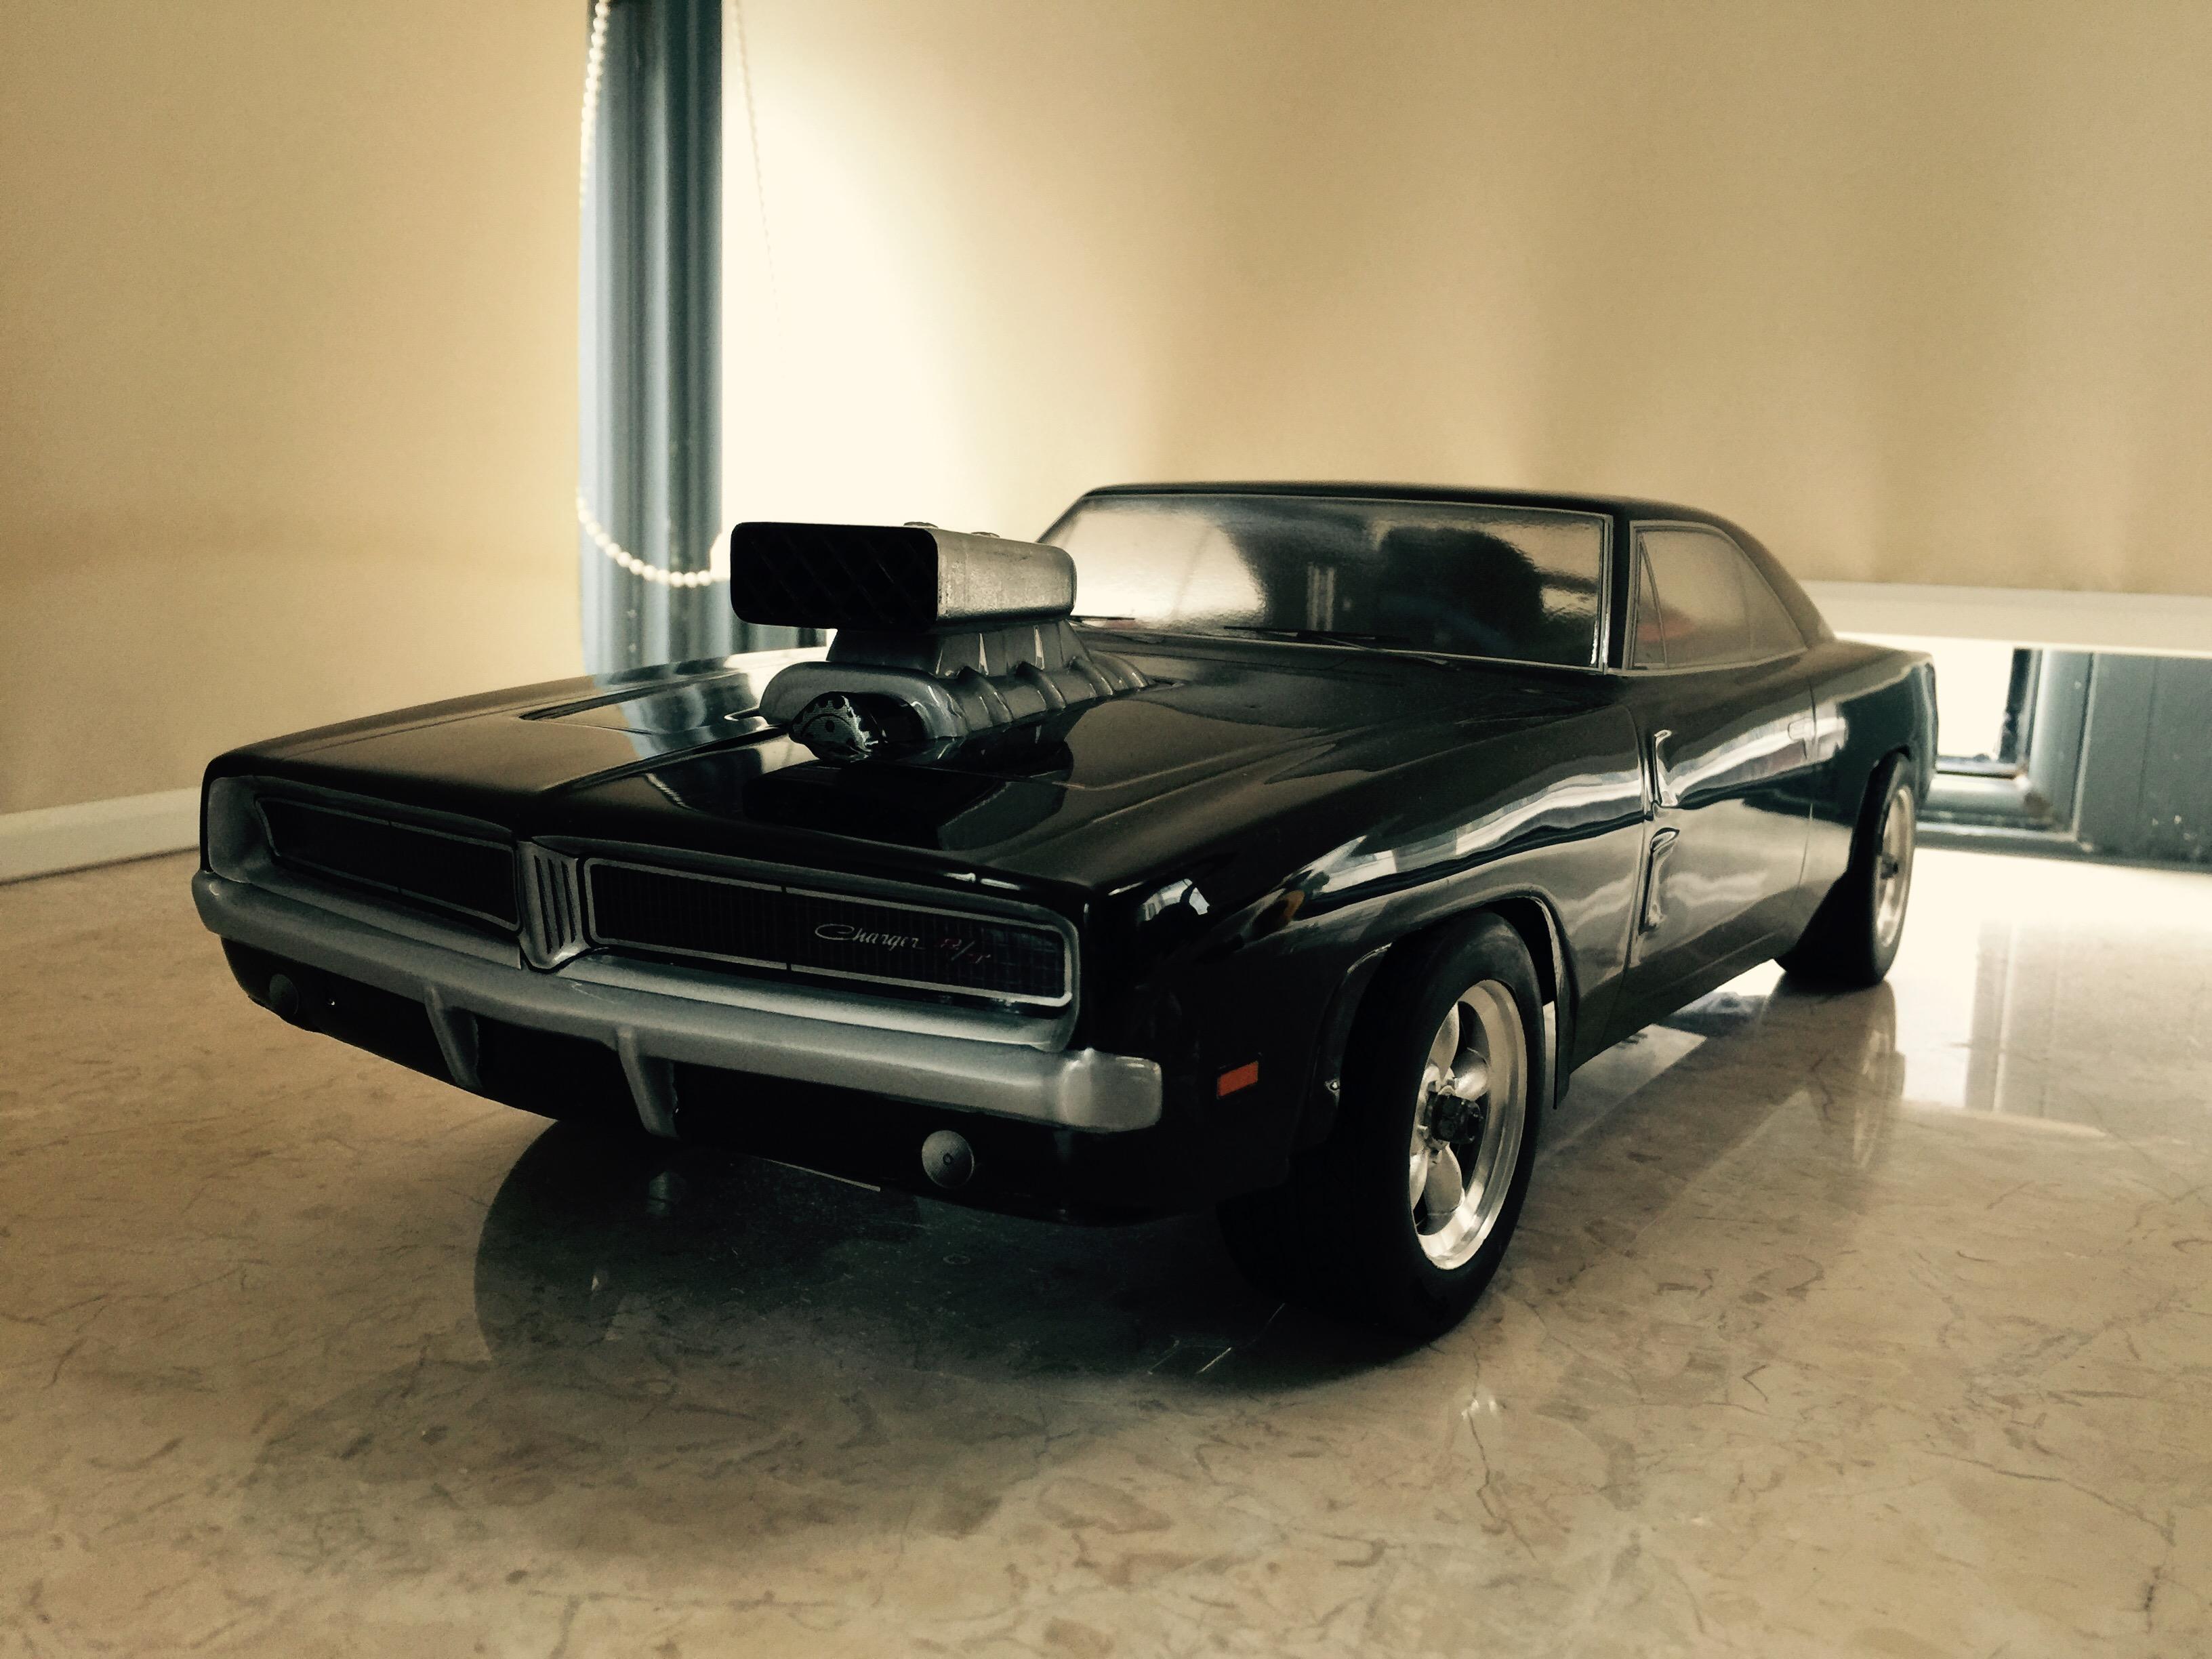 1969 Dodge Charger - RCU Forums